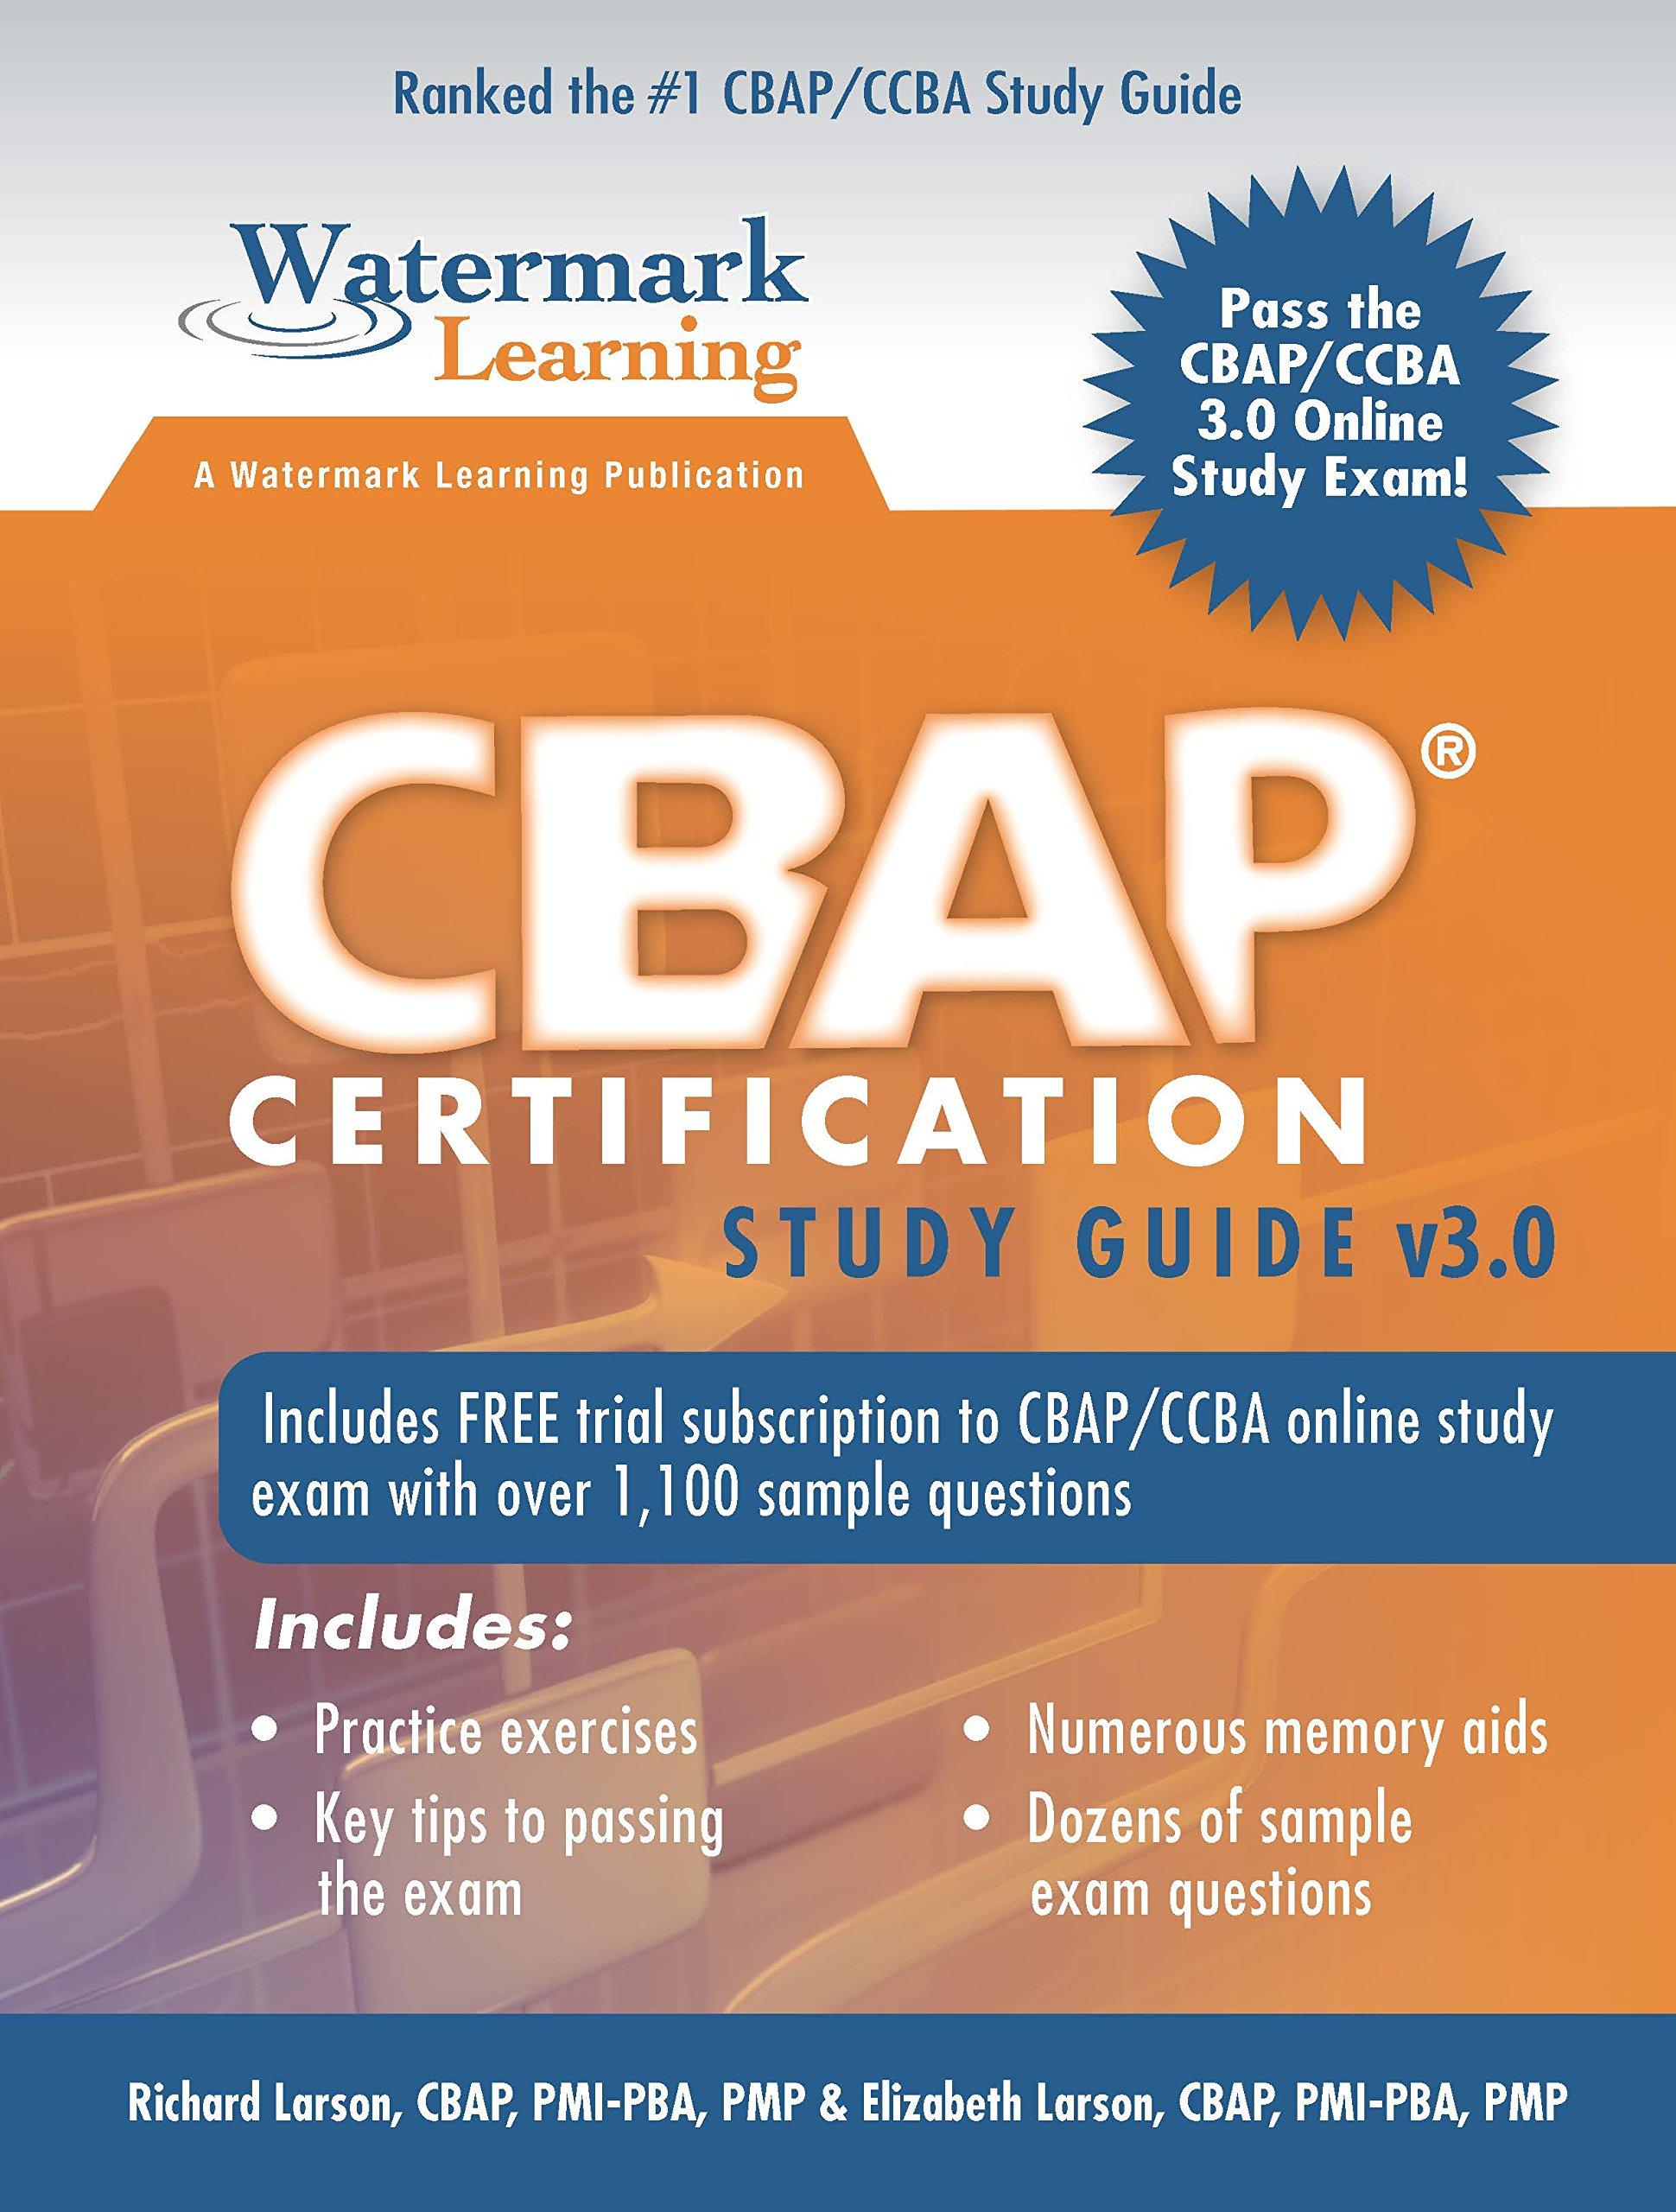 cbap certification study guide v3 0 richard larson elizabeth rh amazon com babok study guide pdf babok v3 study guide pdf